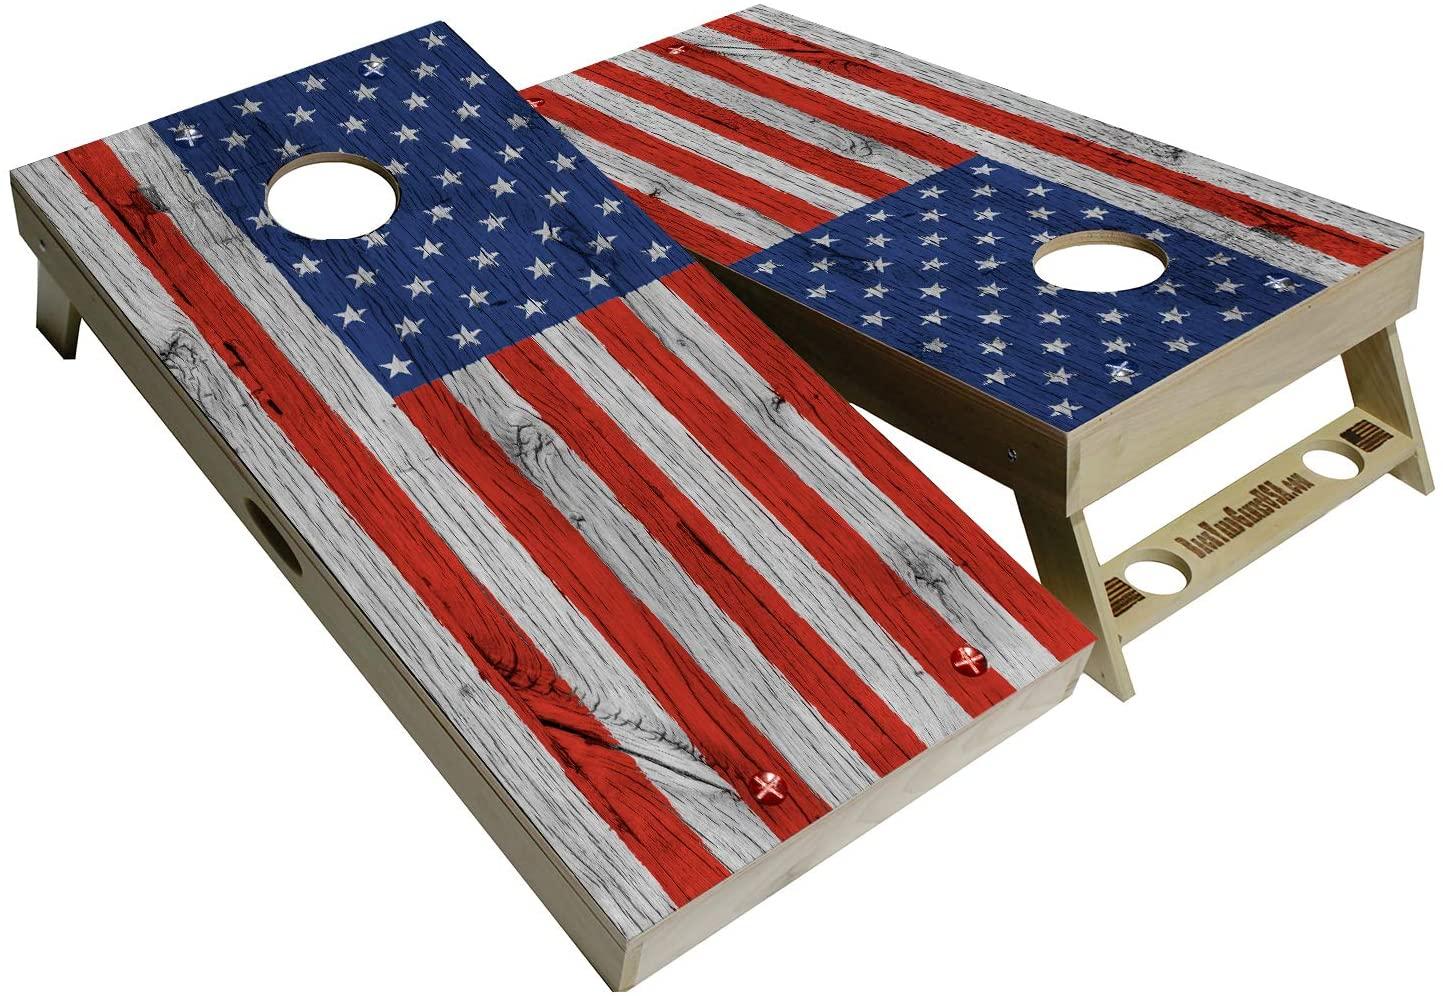 BackYardGamesUSA American Flag Series - Premium Cornhole Boards w Cupholders and a Handle - Includes 2 Regulation 4' x 2' Cornhole Boards w Premium Birch Plywood and 8 Cornhole Bags